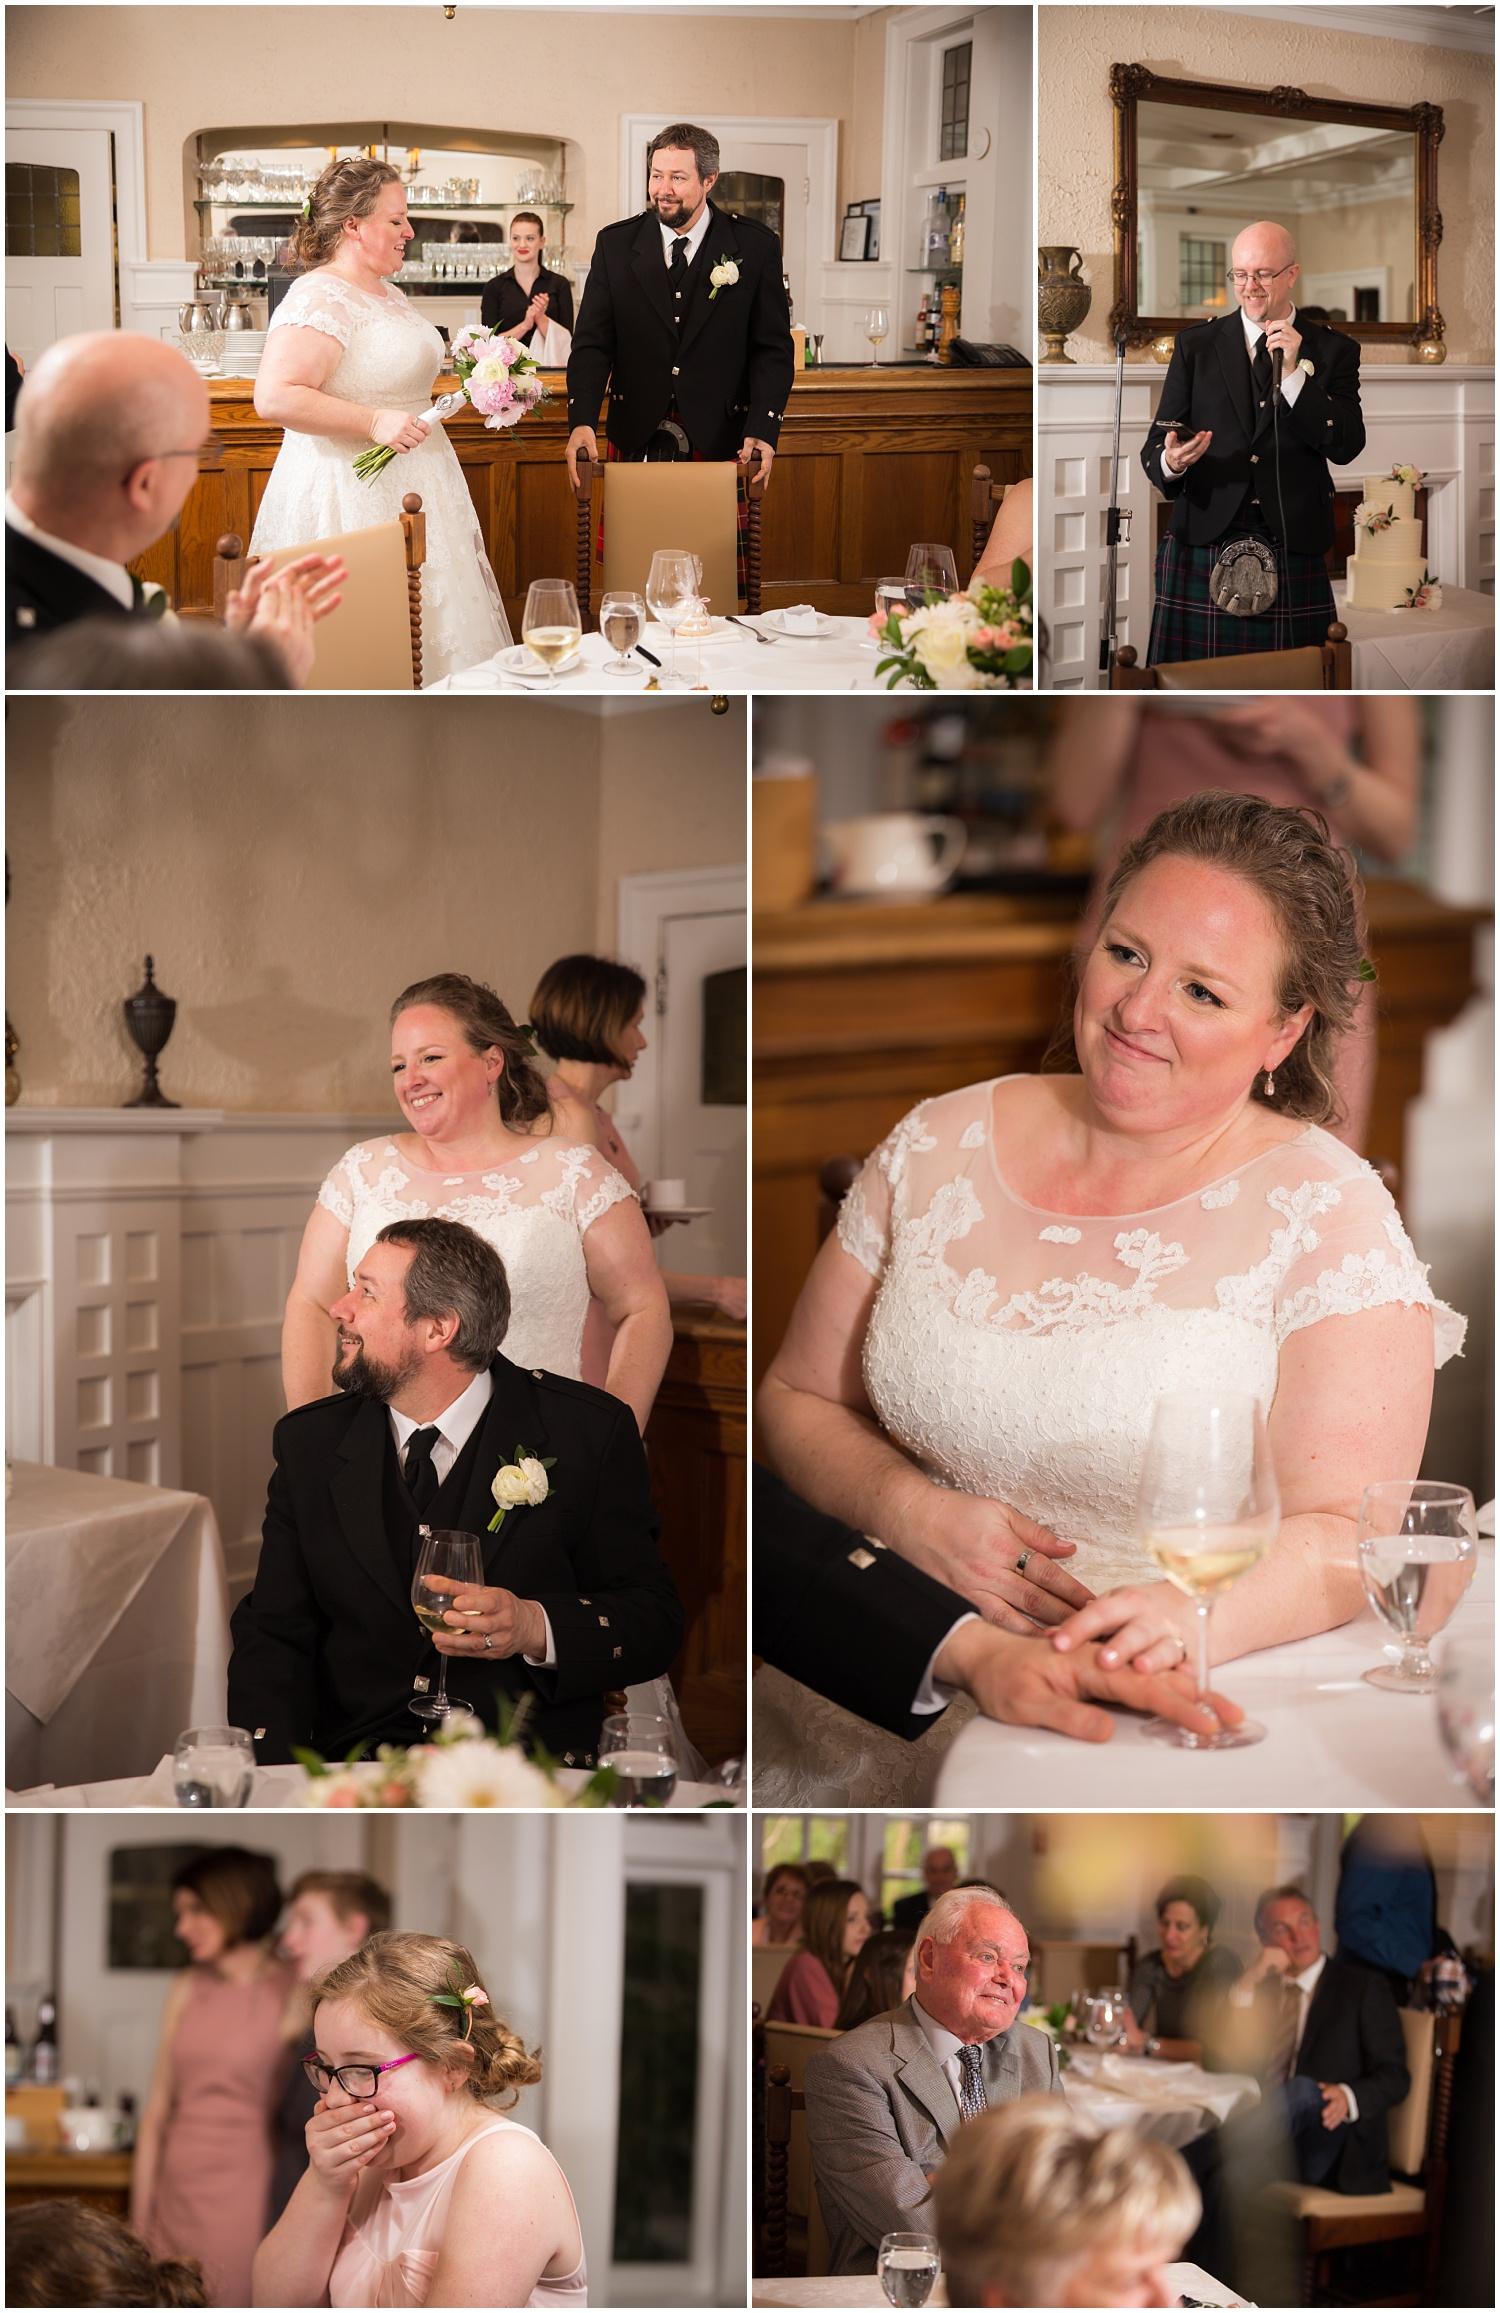 Amazing Day Photography - Hart House Wedding - Deer Lake Park Wedding - Burnaby Wedding Photographer (13).jpg